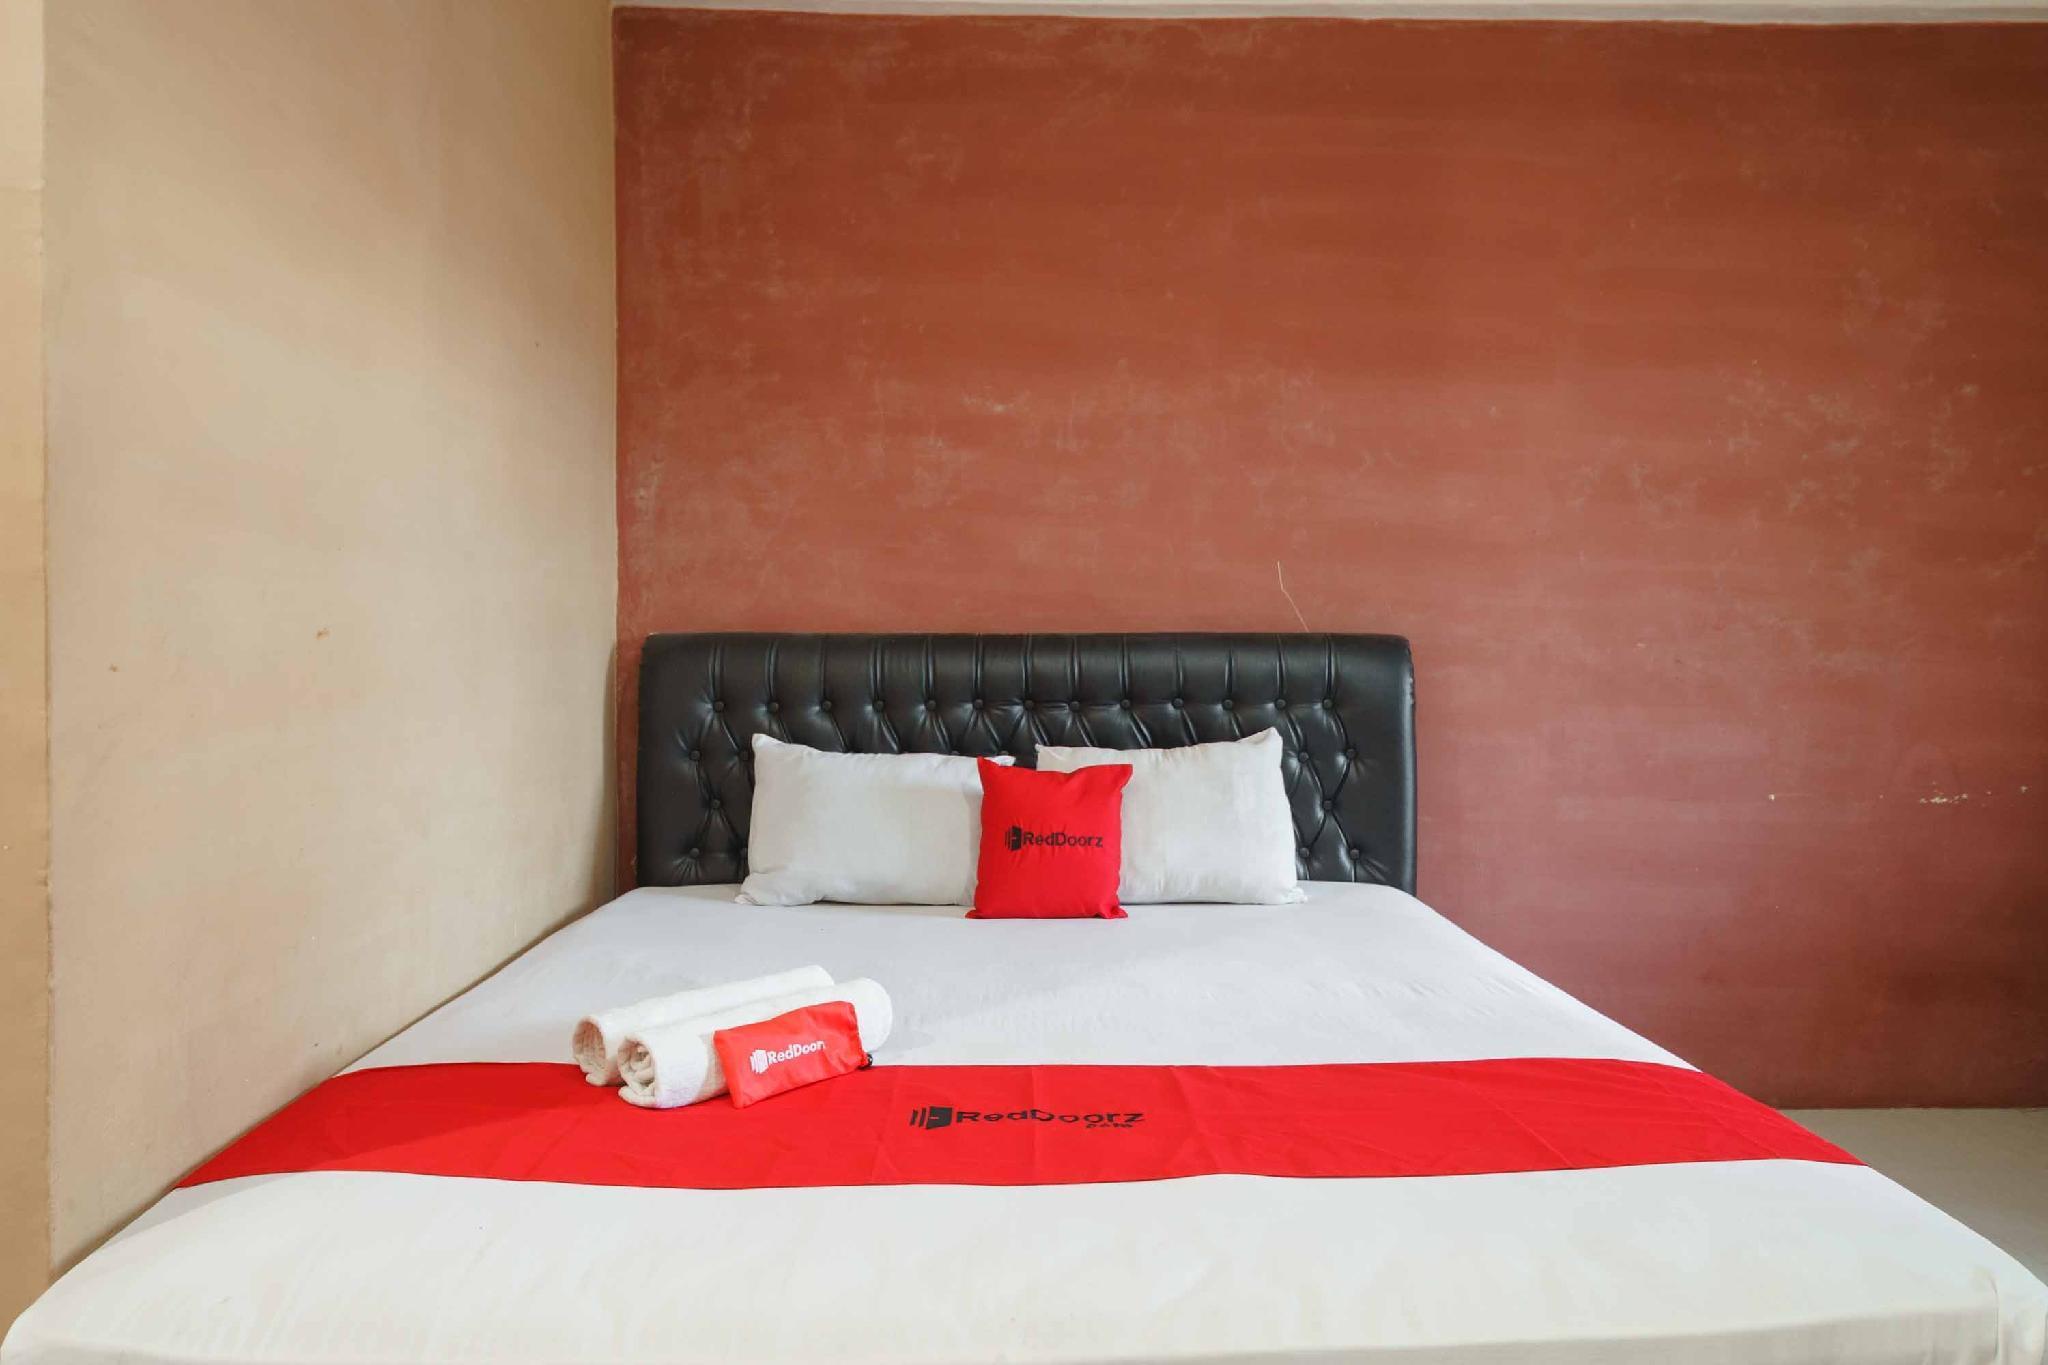 RedDoorz Syariah Hotel Enasti Berastagi, Karo